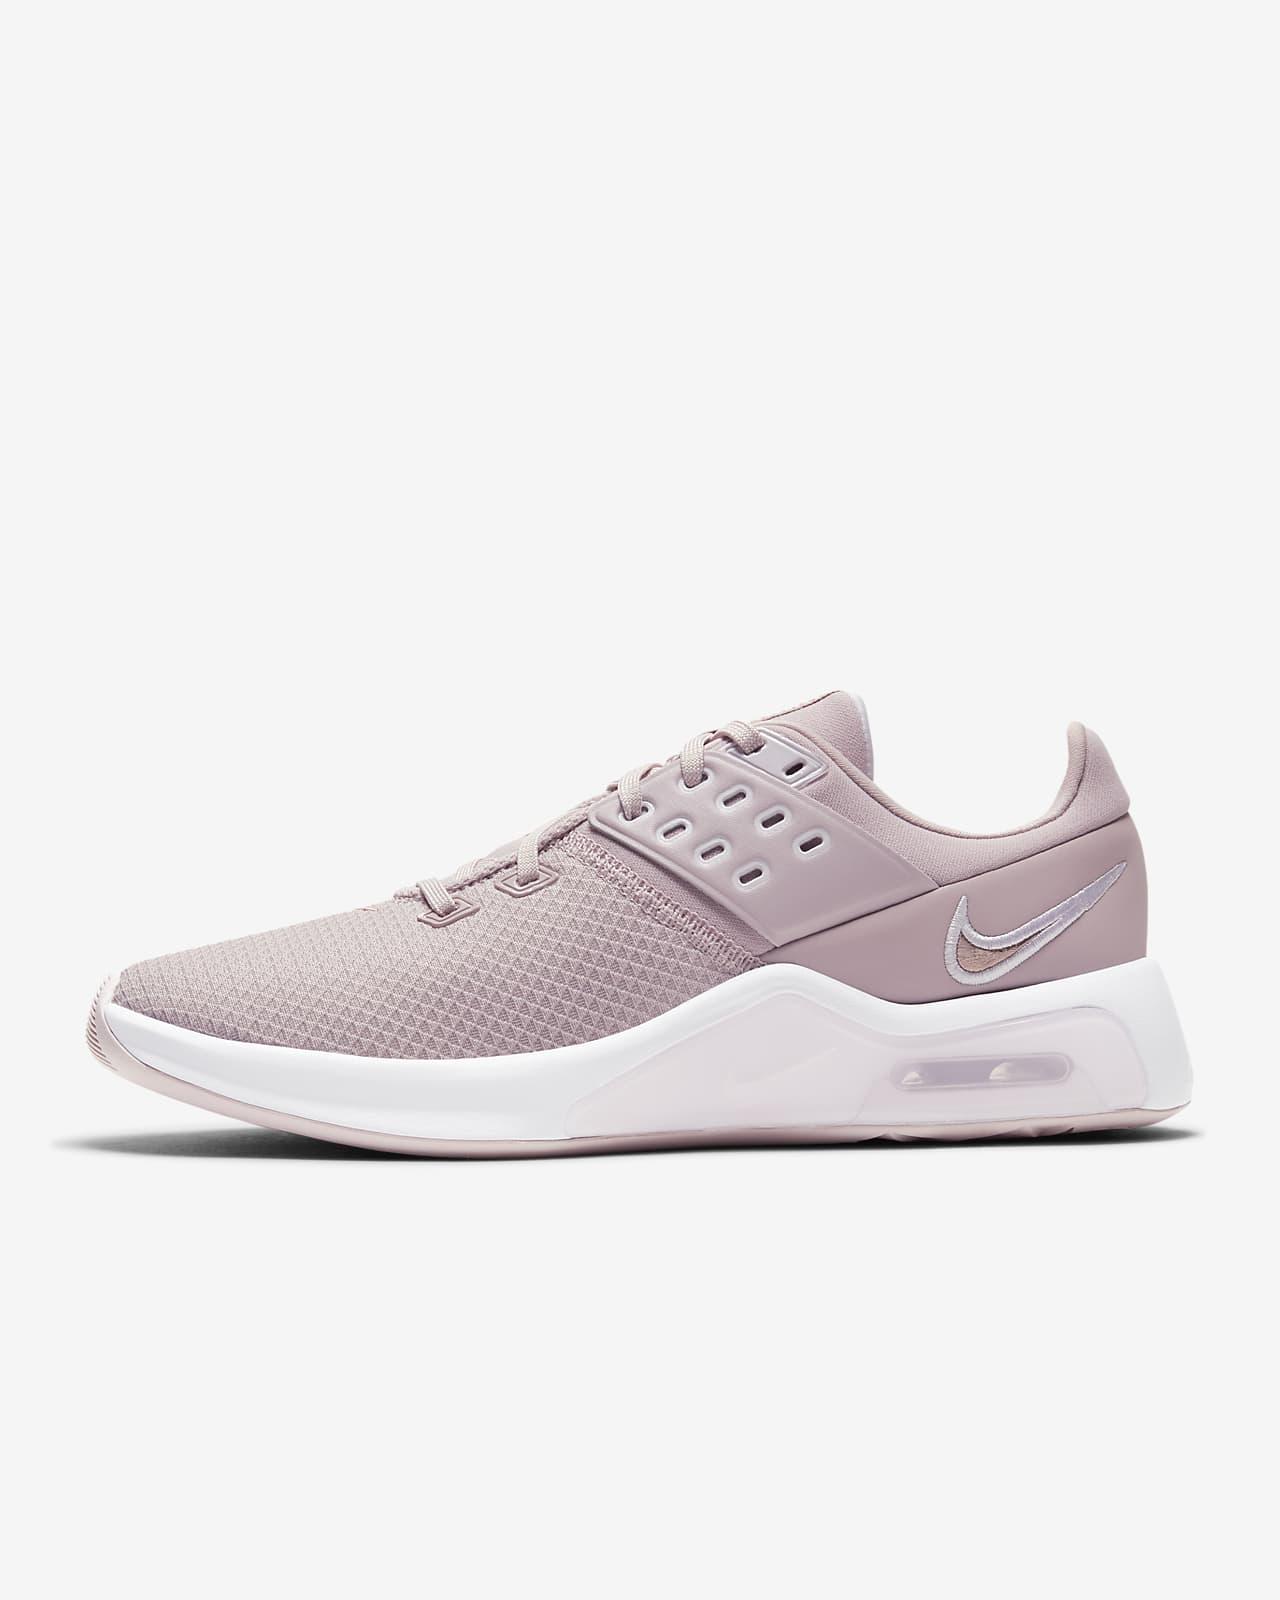 Chaussure de training Nike Air Max Bella TR 4 pour Femme